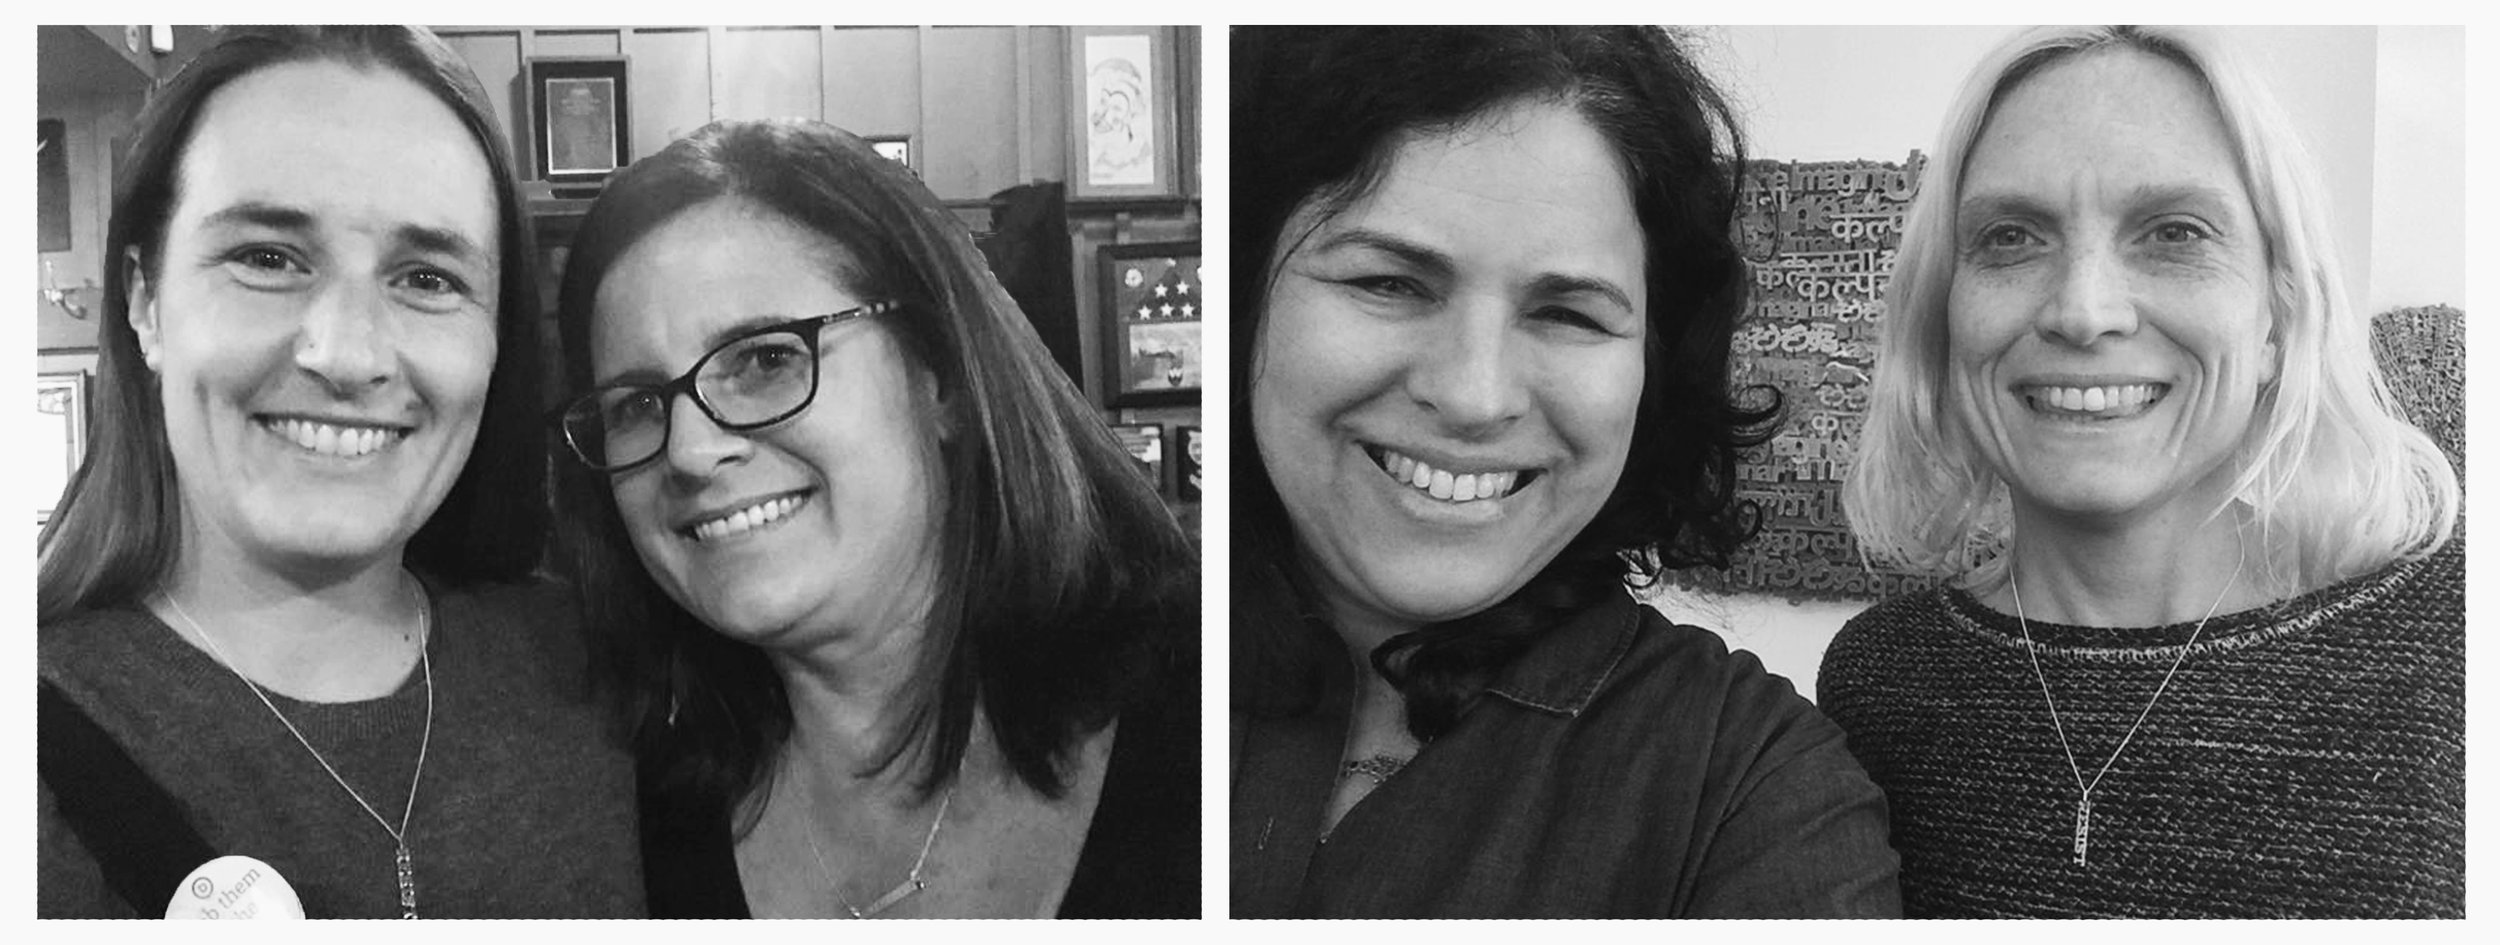 Left to right: Lesley Bauer with EC Gold | Yael Kanarek with Jennifer Flynn Walker